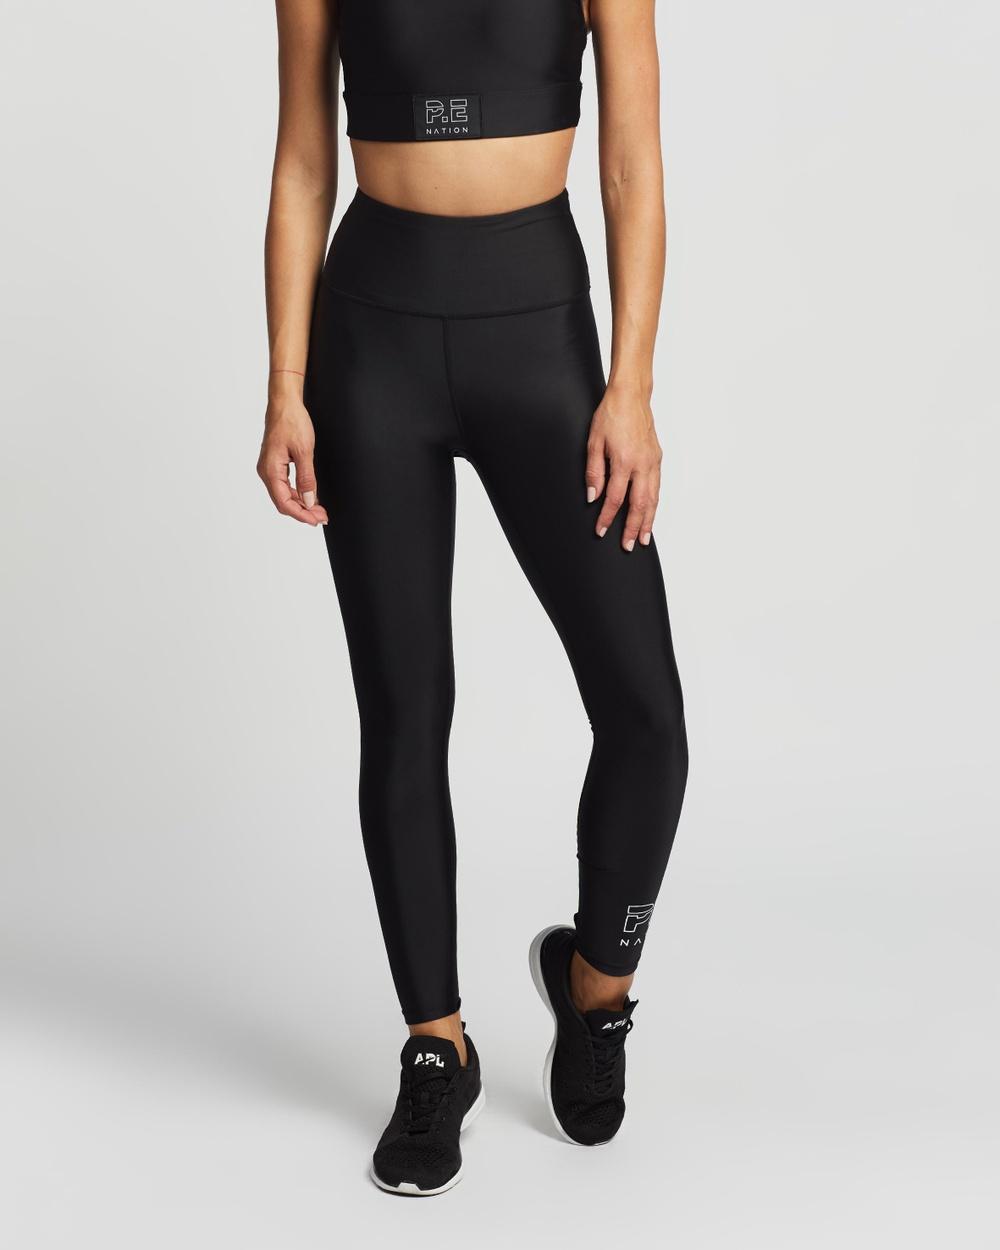 P.E Nation Baseline Endurance Leggings all compression Black